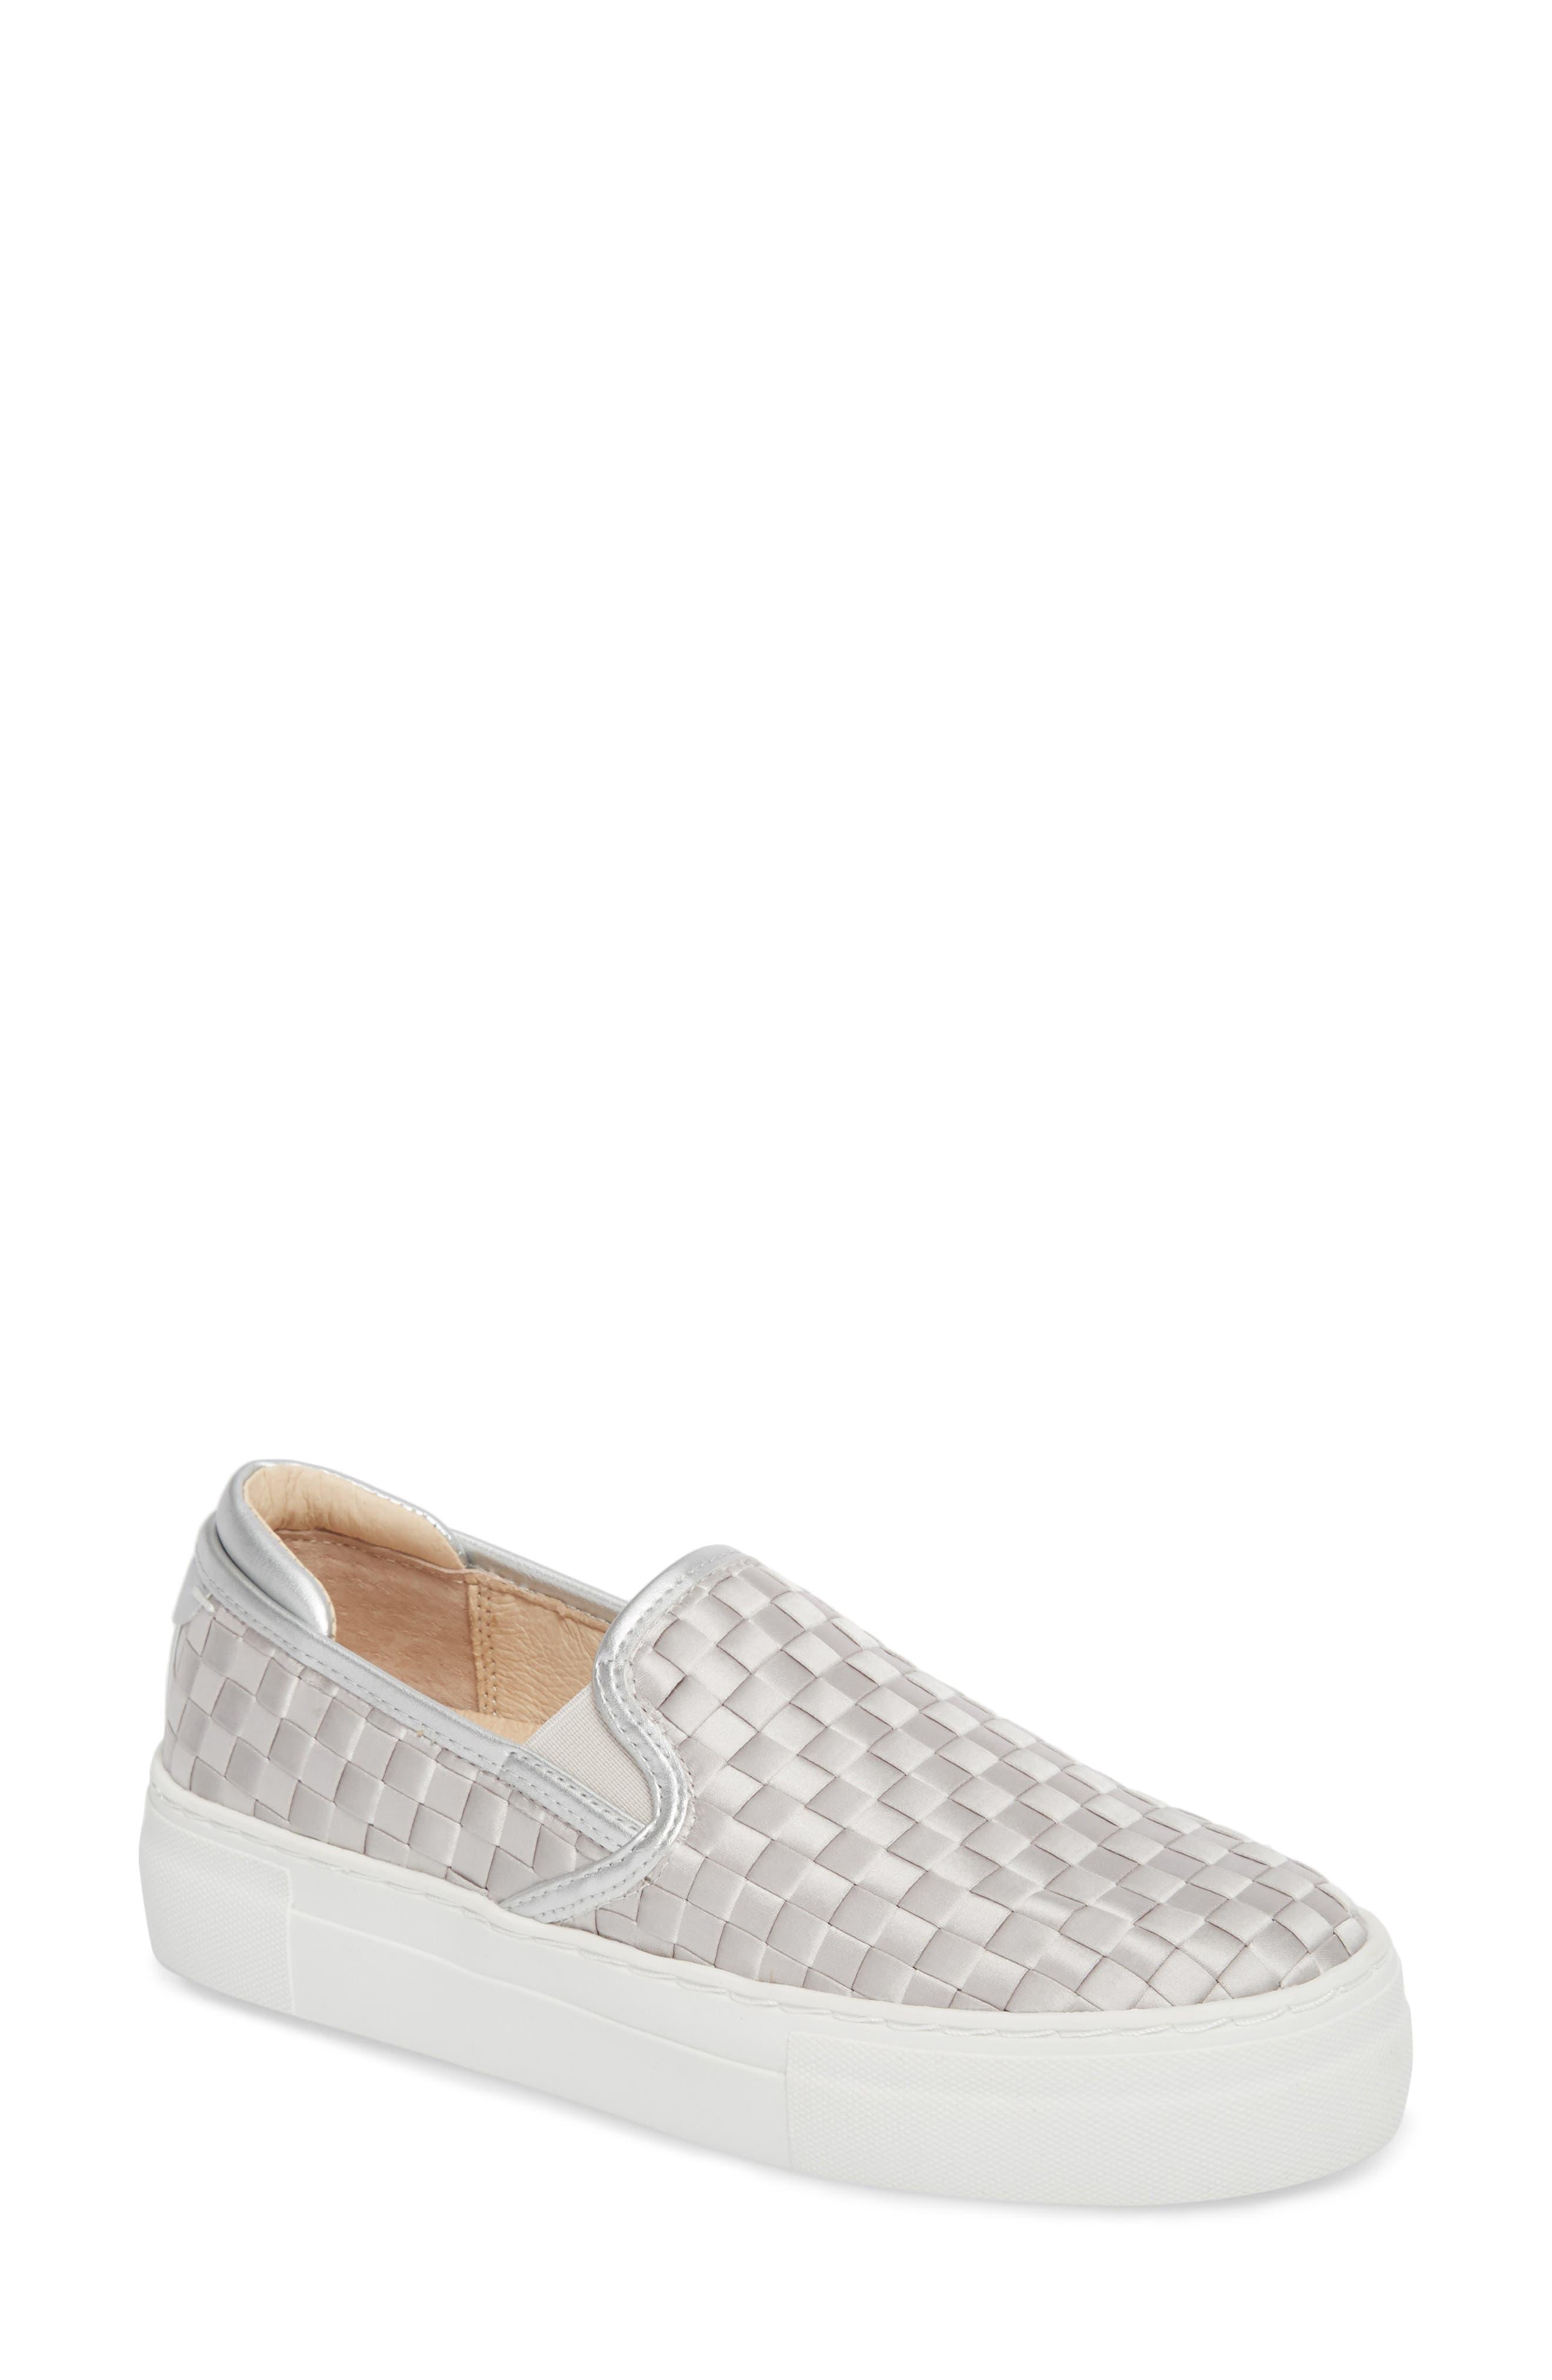 Monte Woven Slip-On Sneaker,                         Main,                         color, Silver Satin